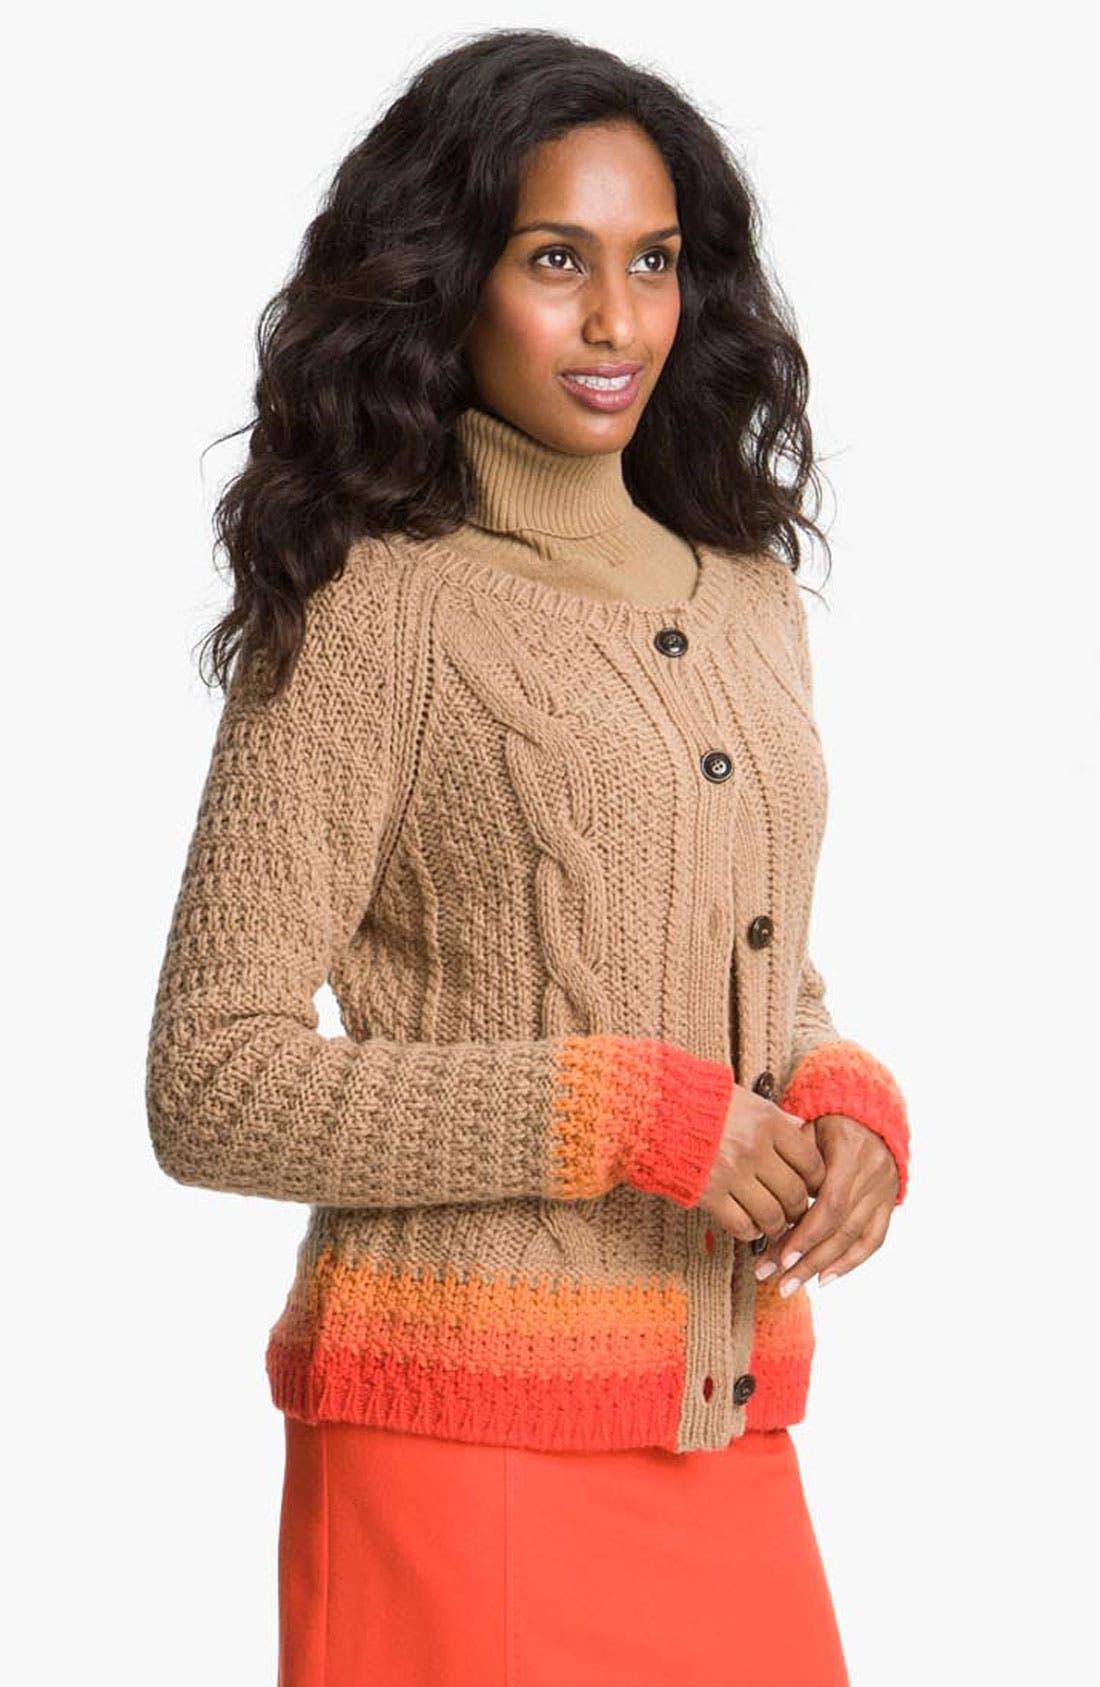 Alternate Image 1 Selected - Weekend Max Mara 'Nerina' Knit Sweater